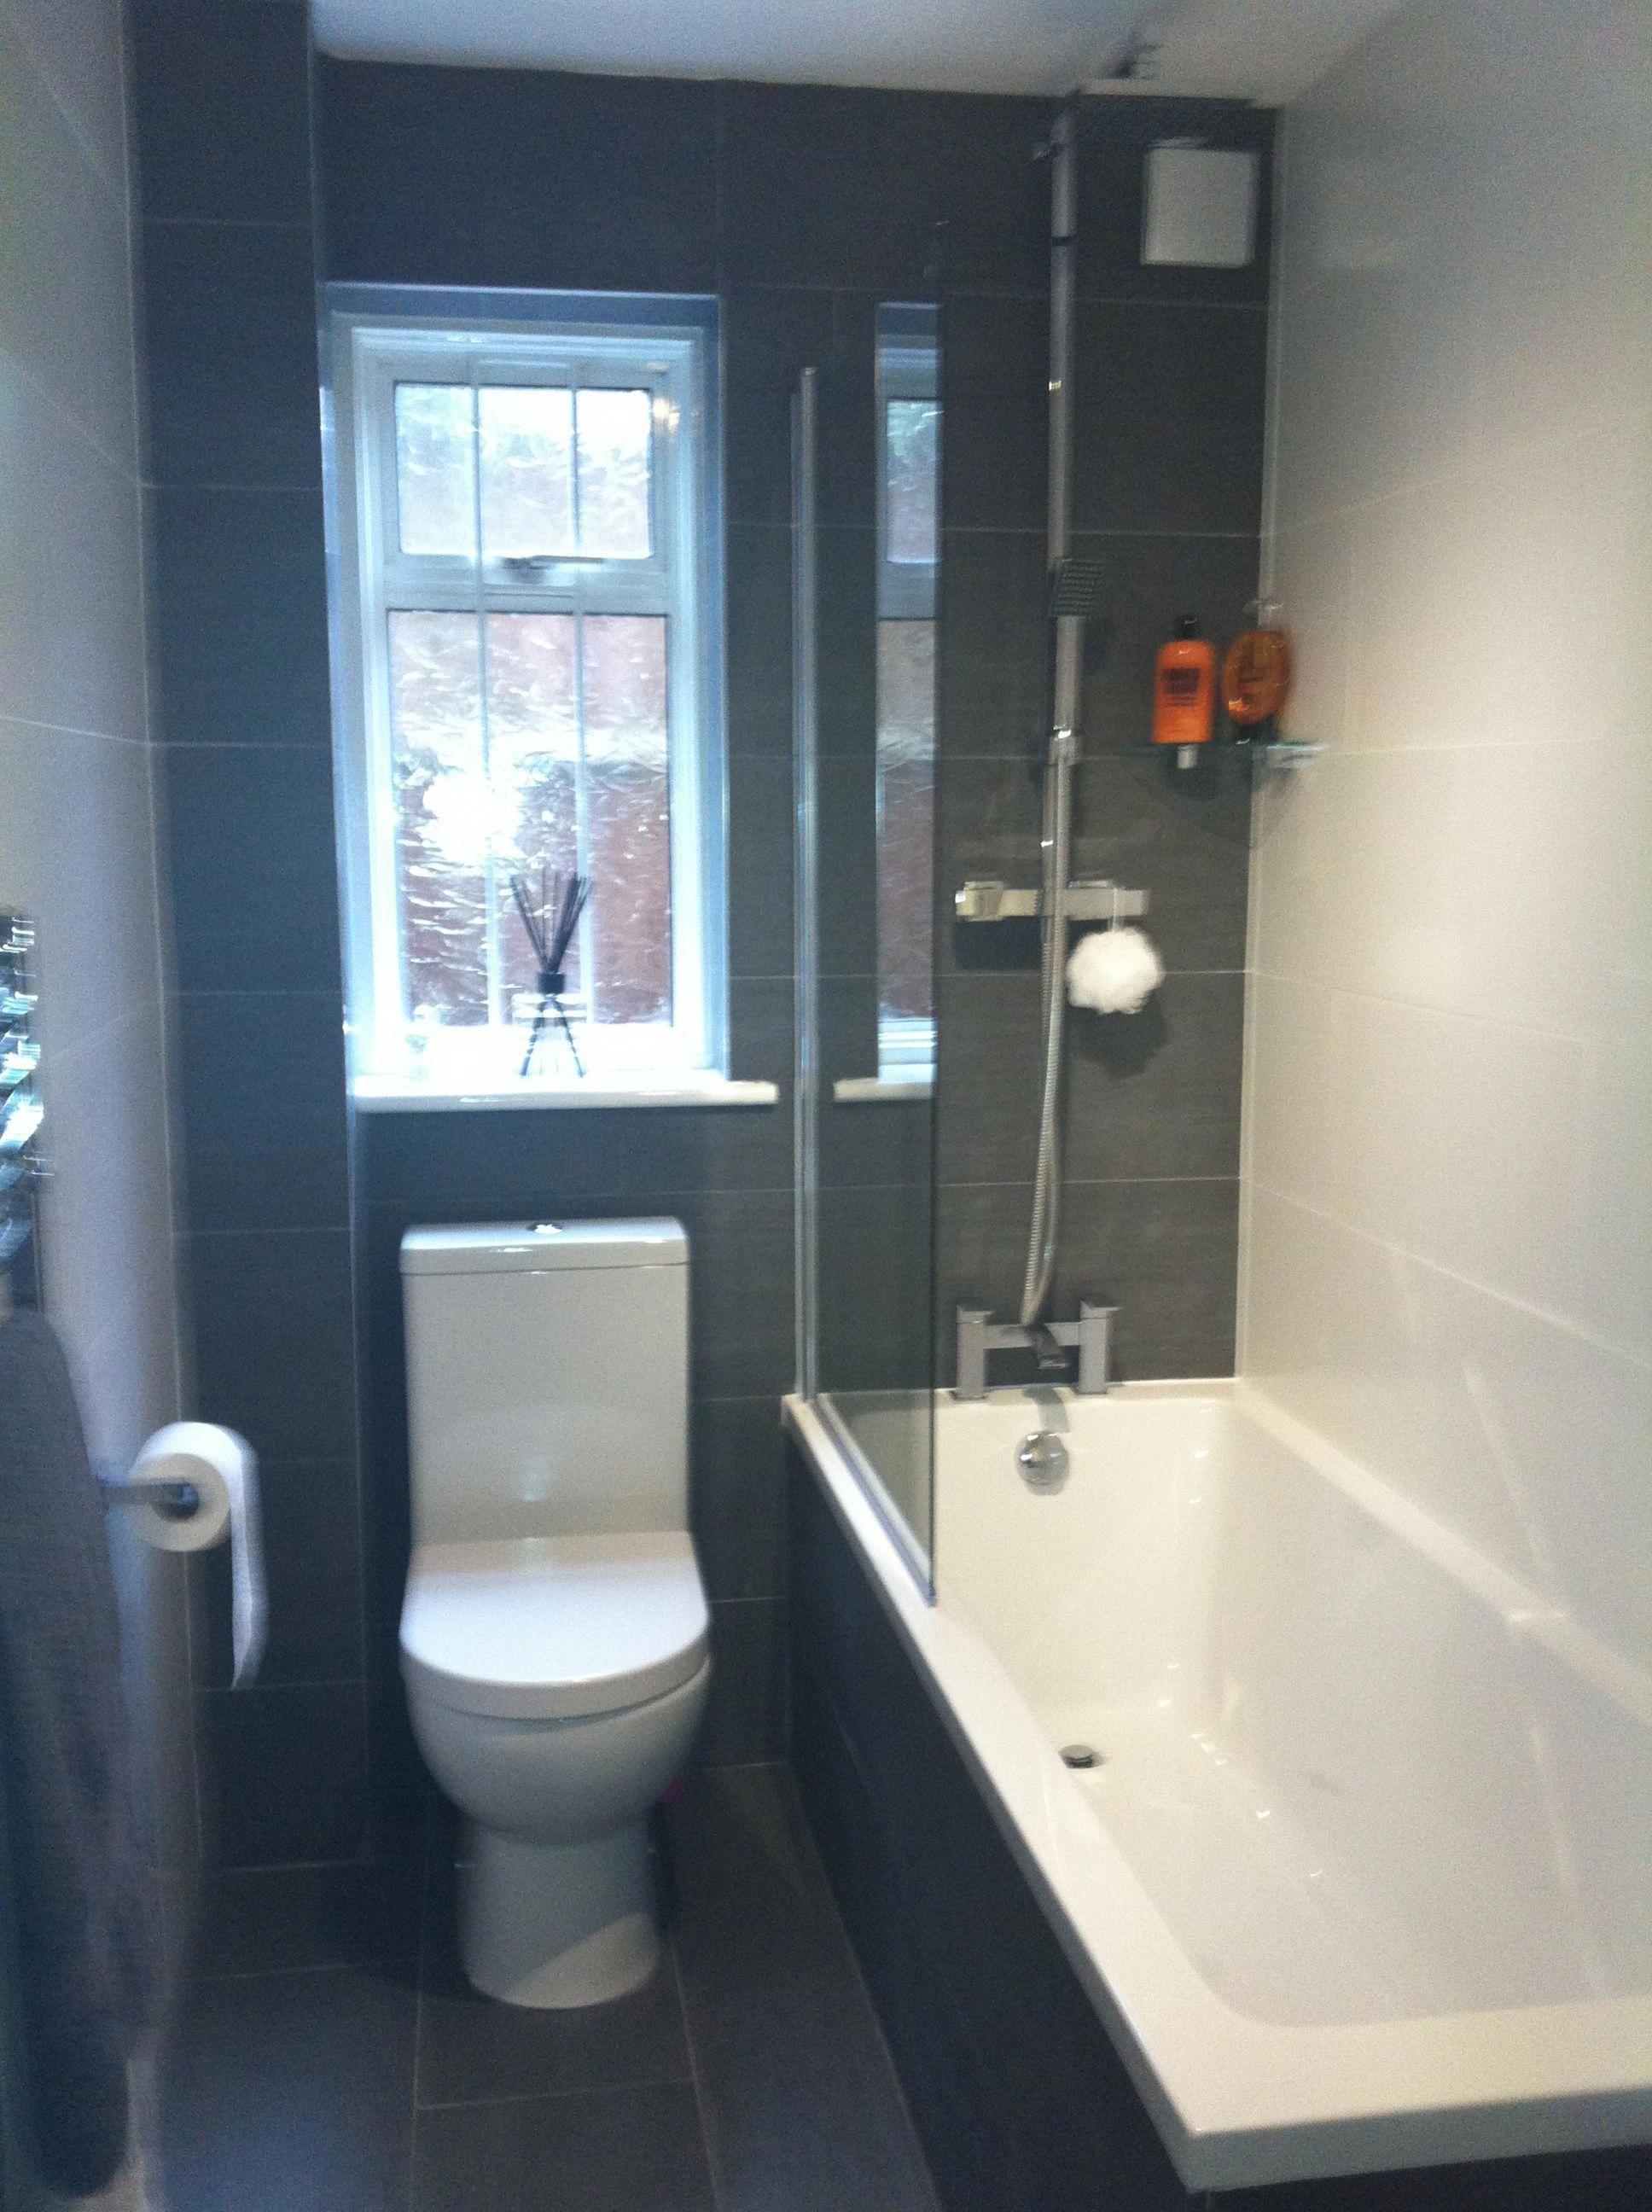 Bathroom Cabinet Ideas In 2021 [50+ Ideas For Bathroom ...